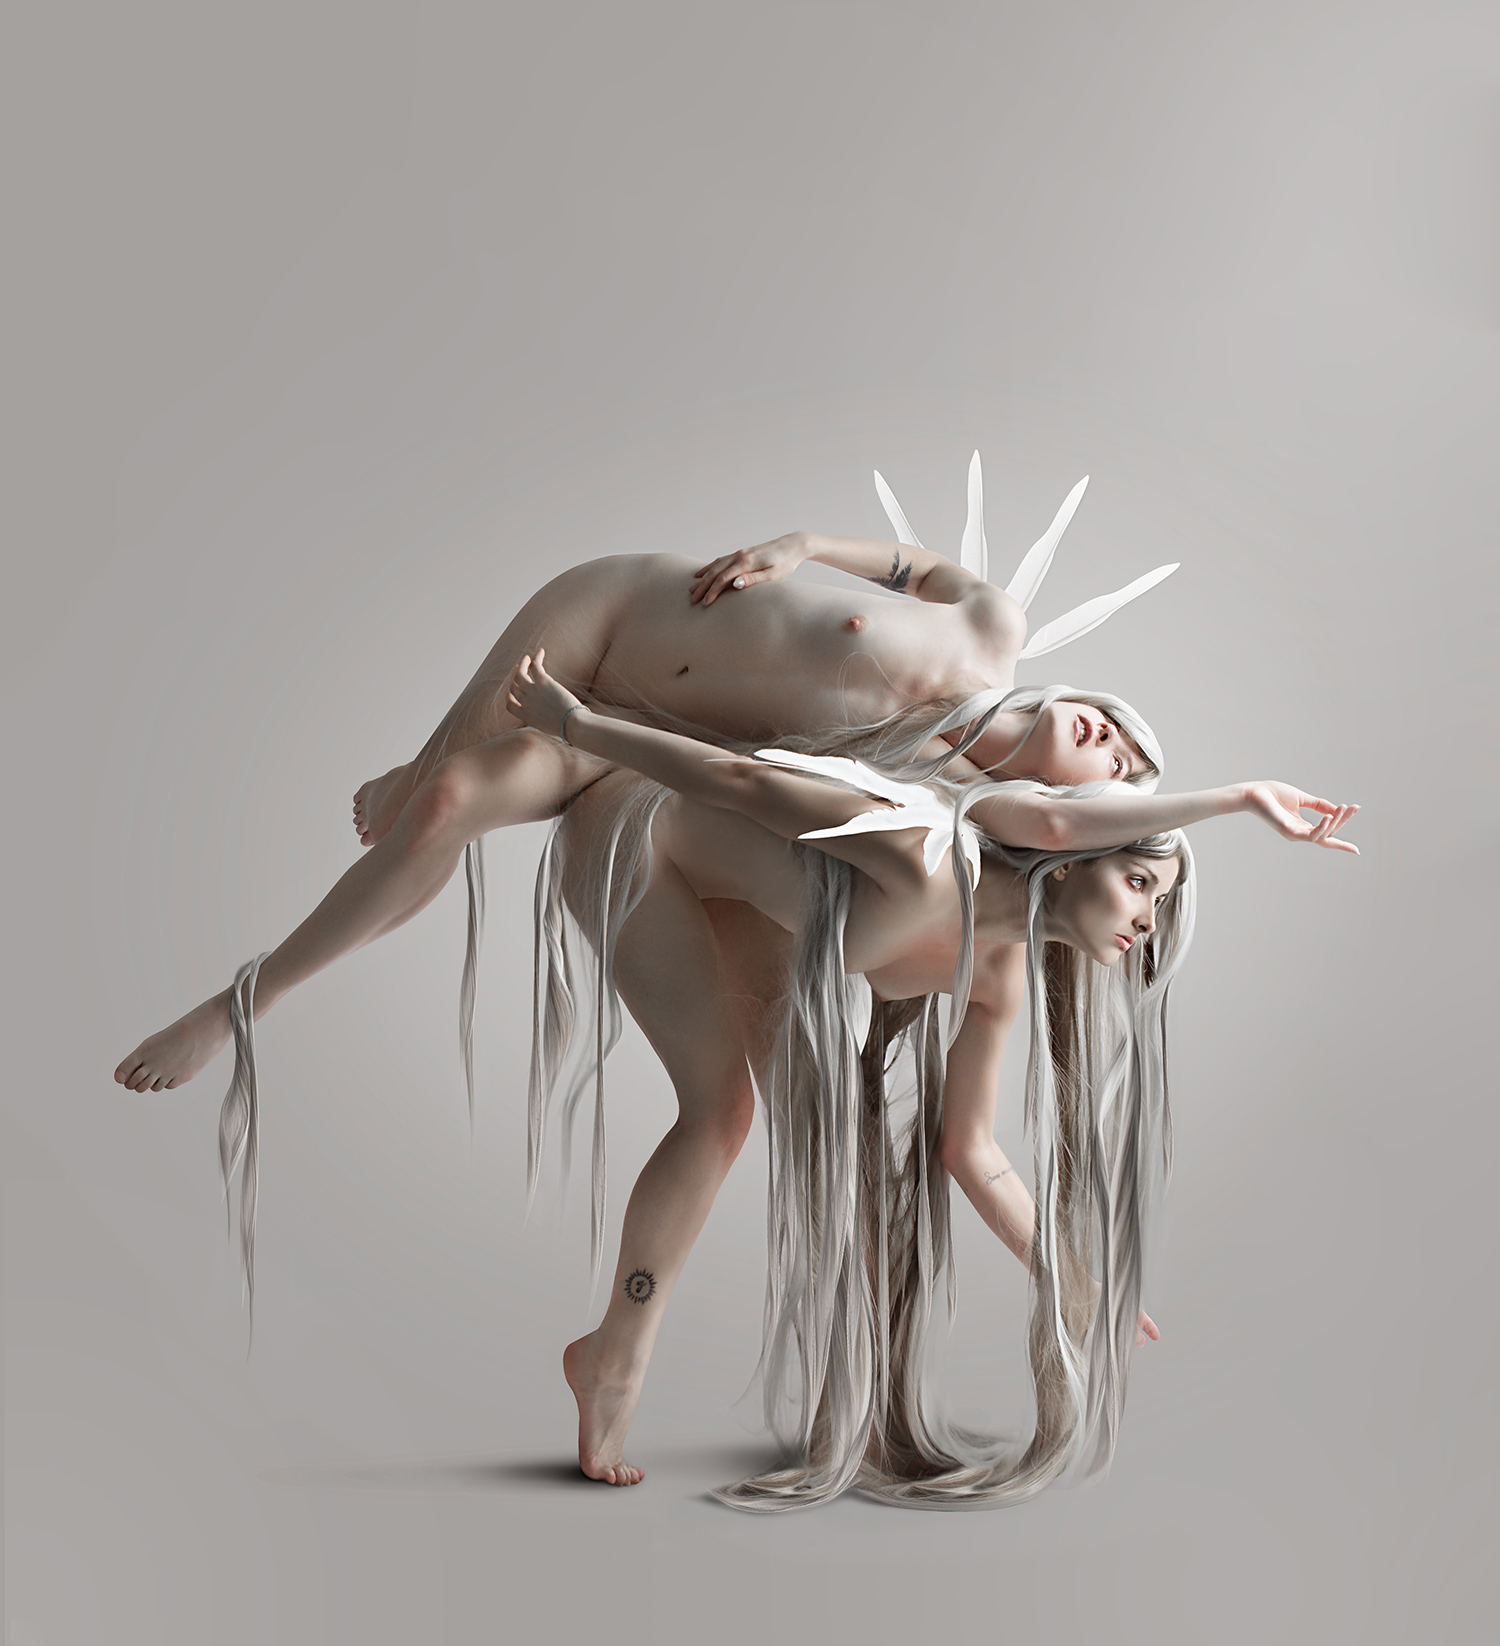 Delphine Celcig - Fallen Angels - Equilibrium